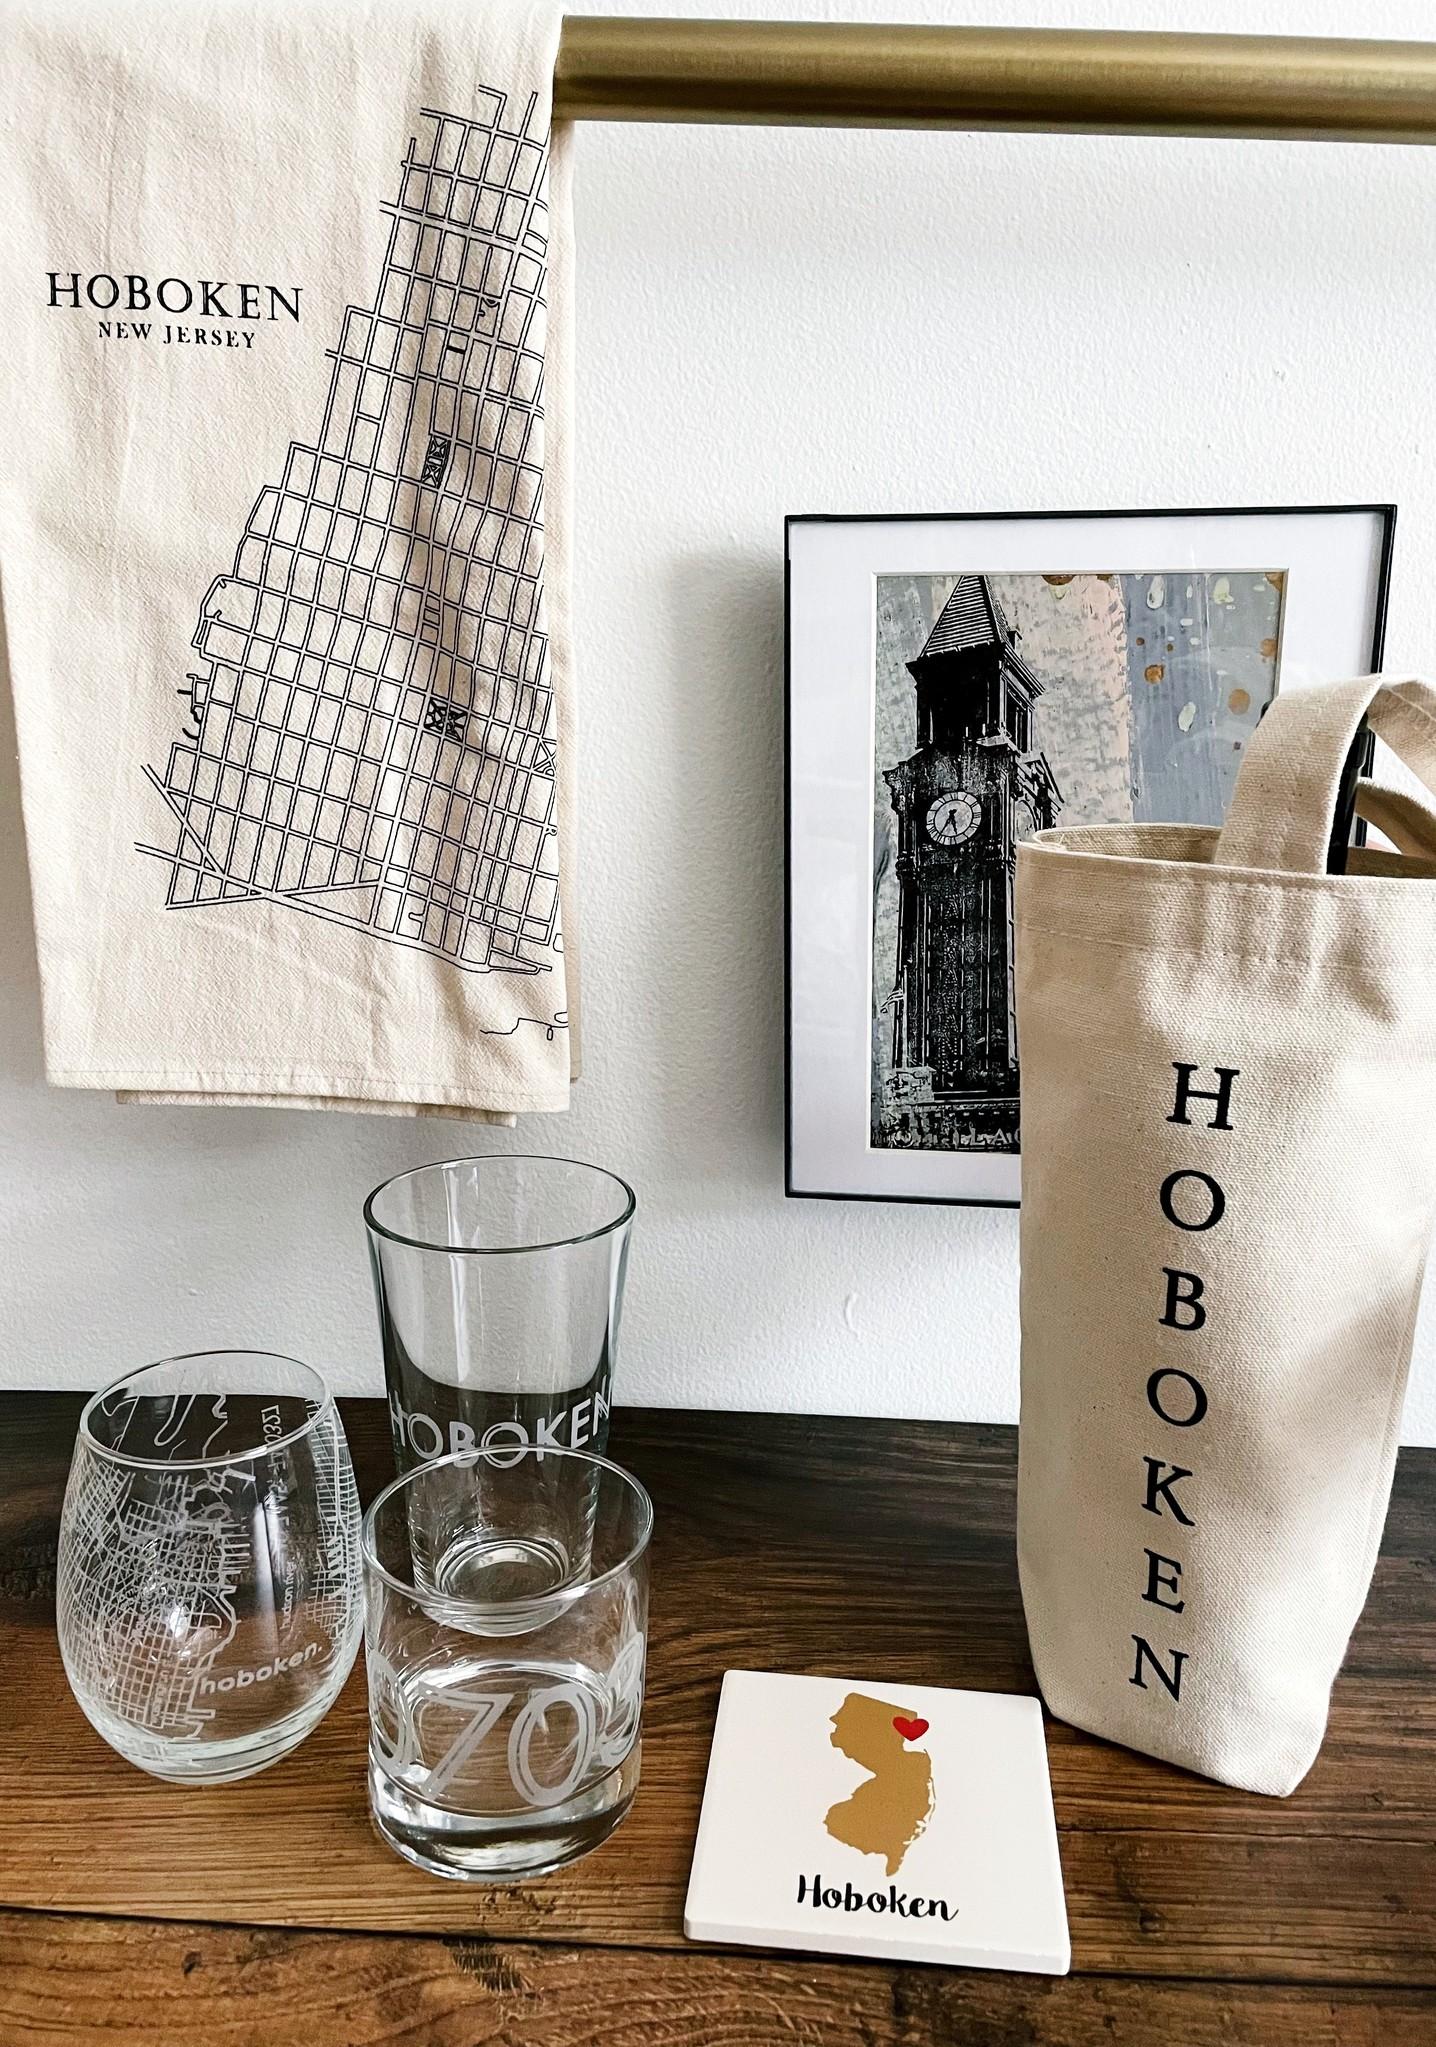 Monster Dance Designs Hoboken Etched Pint Glass